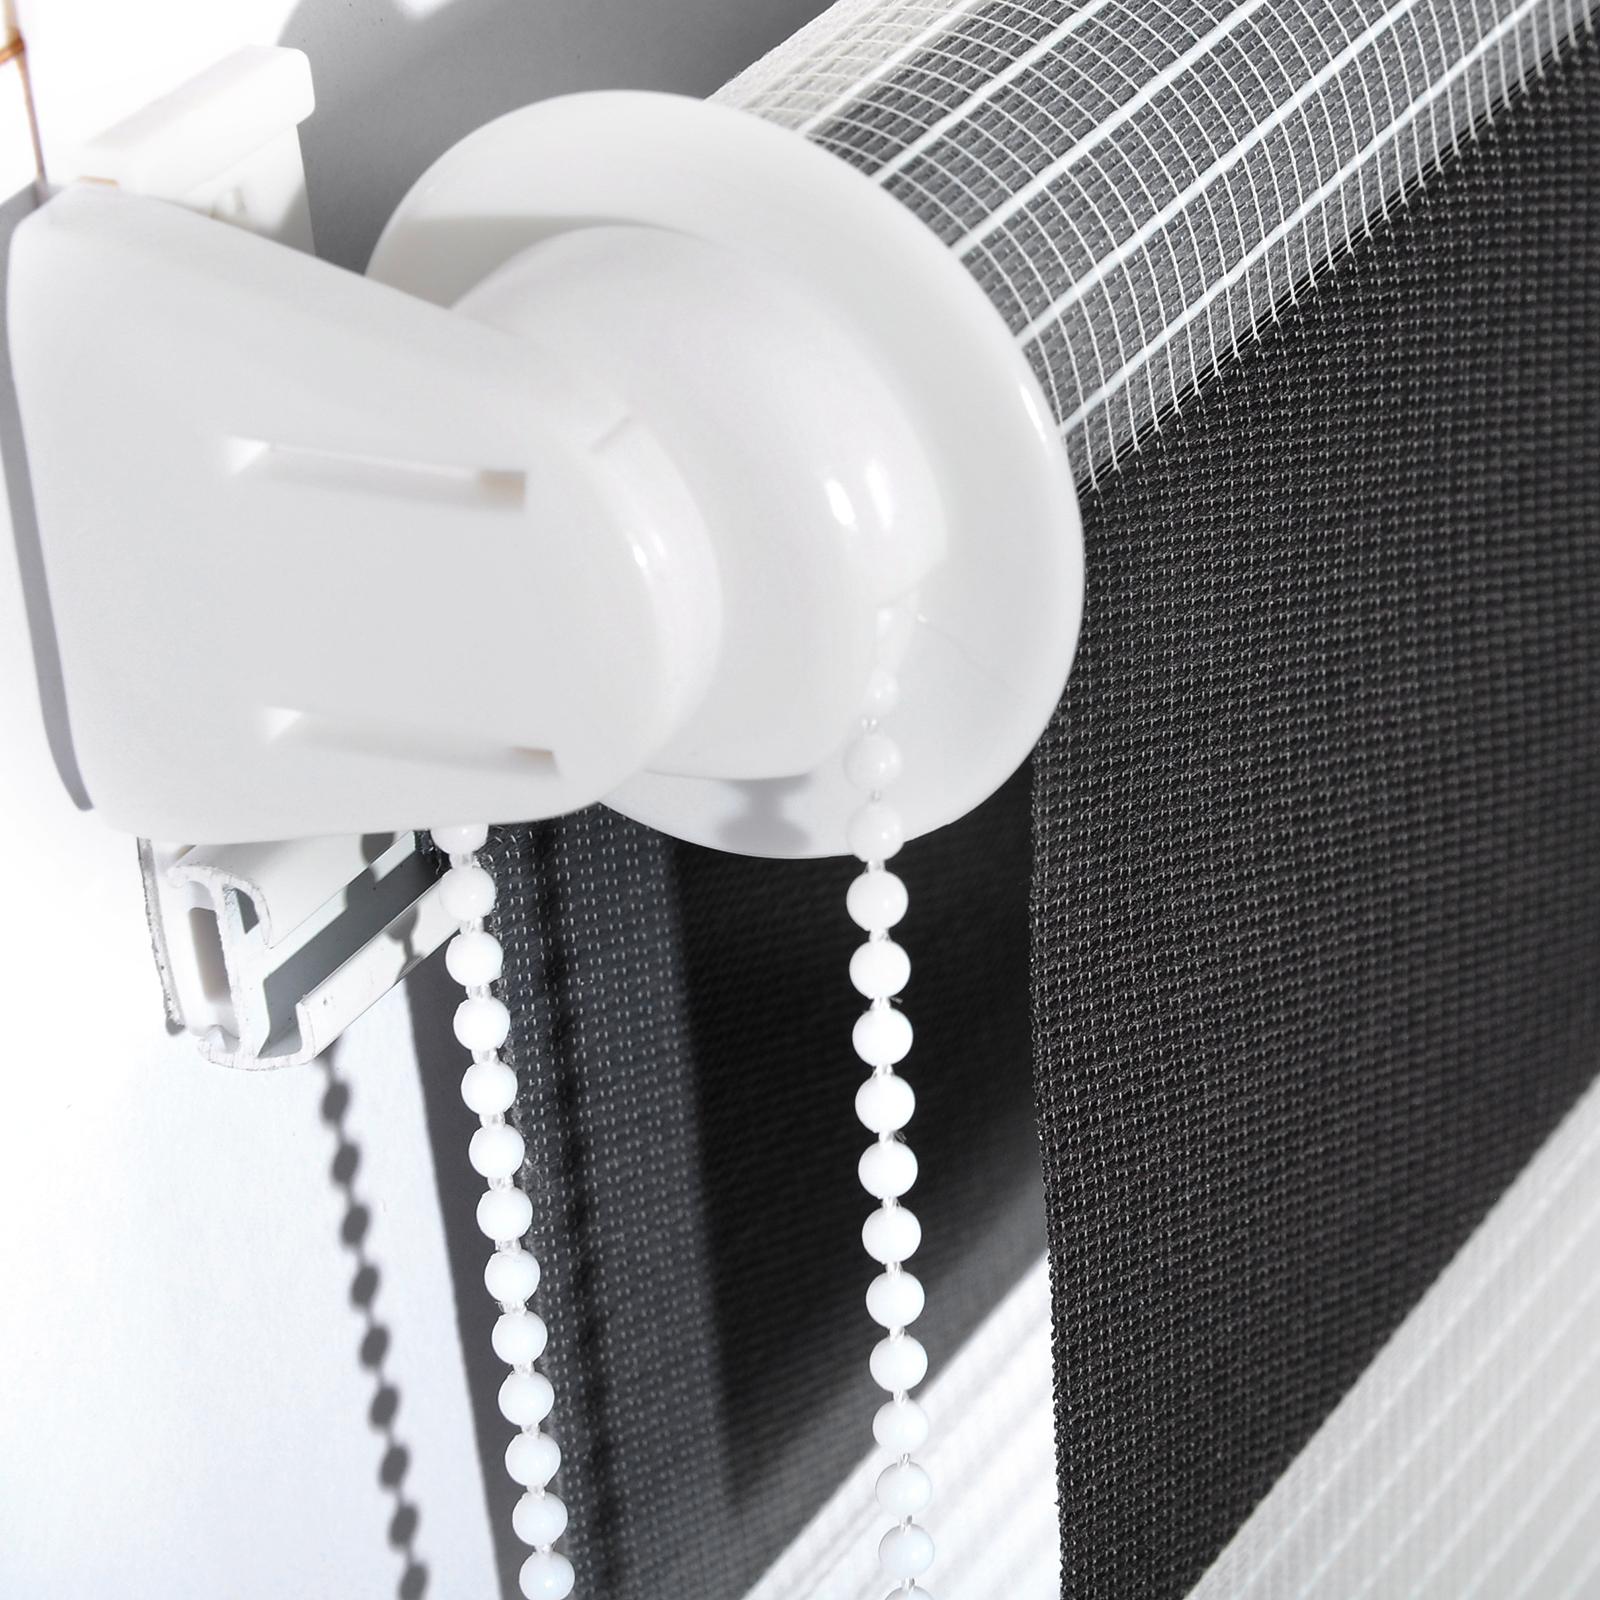 doppelrollo duo rollo klemmfix ohne bohren easyfix fenster seitenzugrollo 462. Black Bedroom Furniture Sets. Home Design Ideas